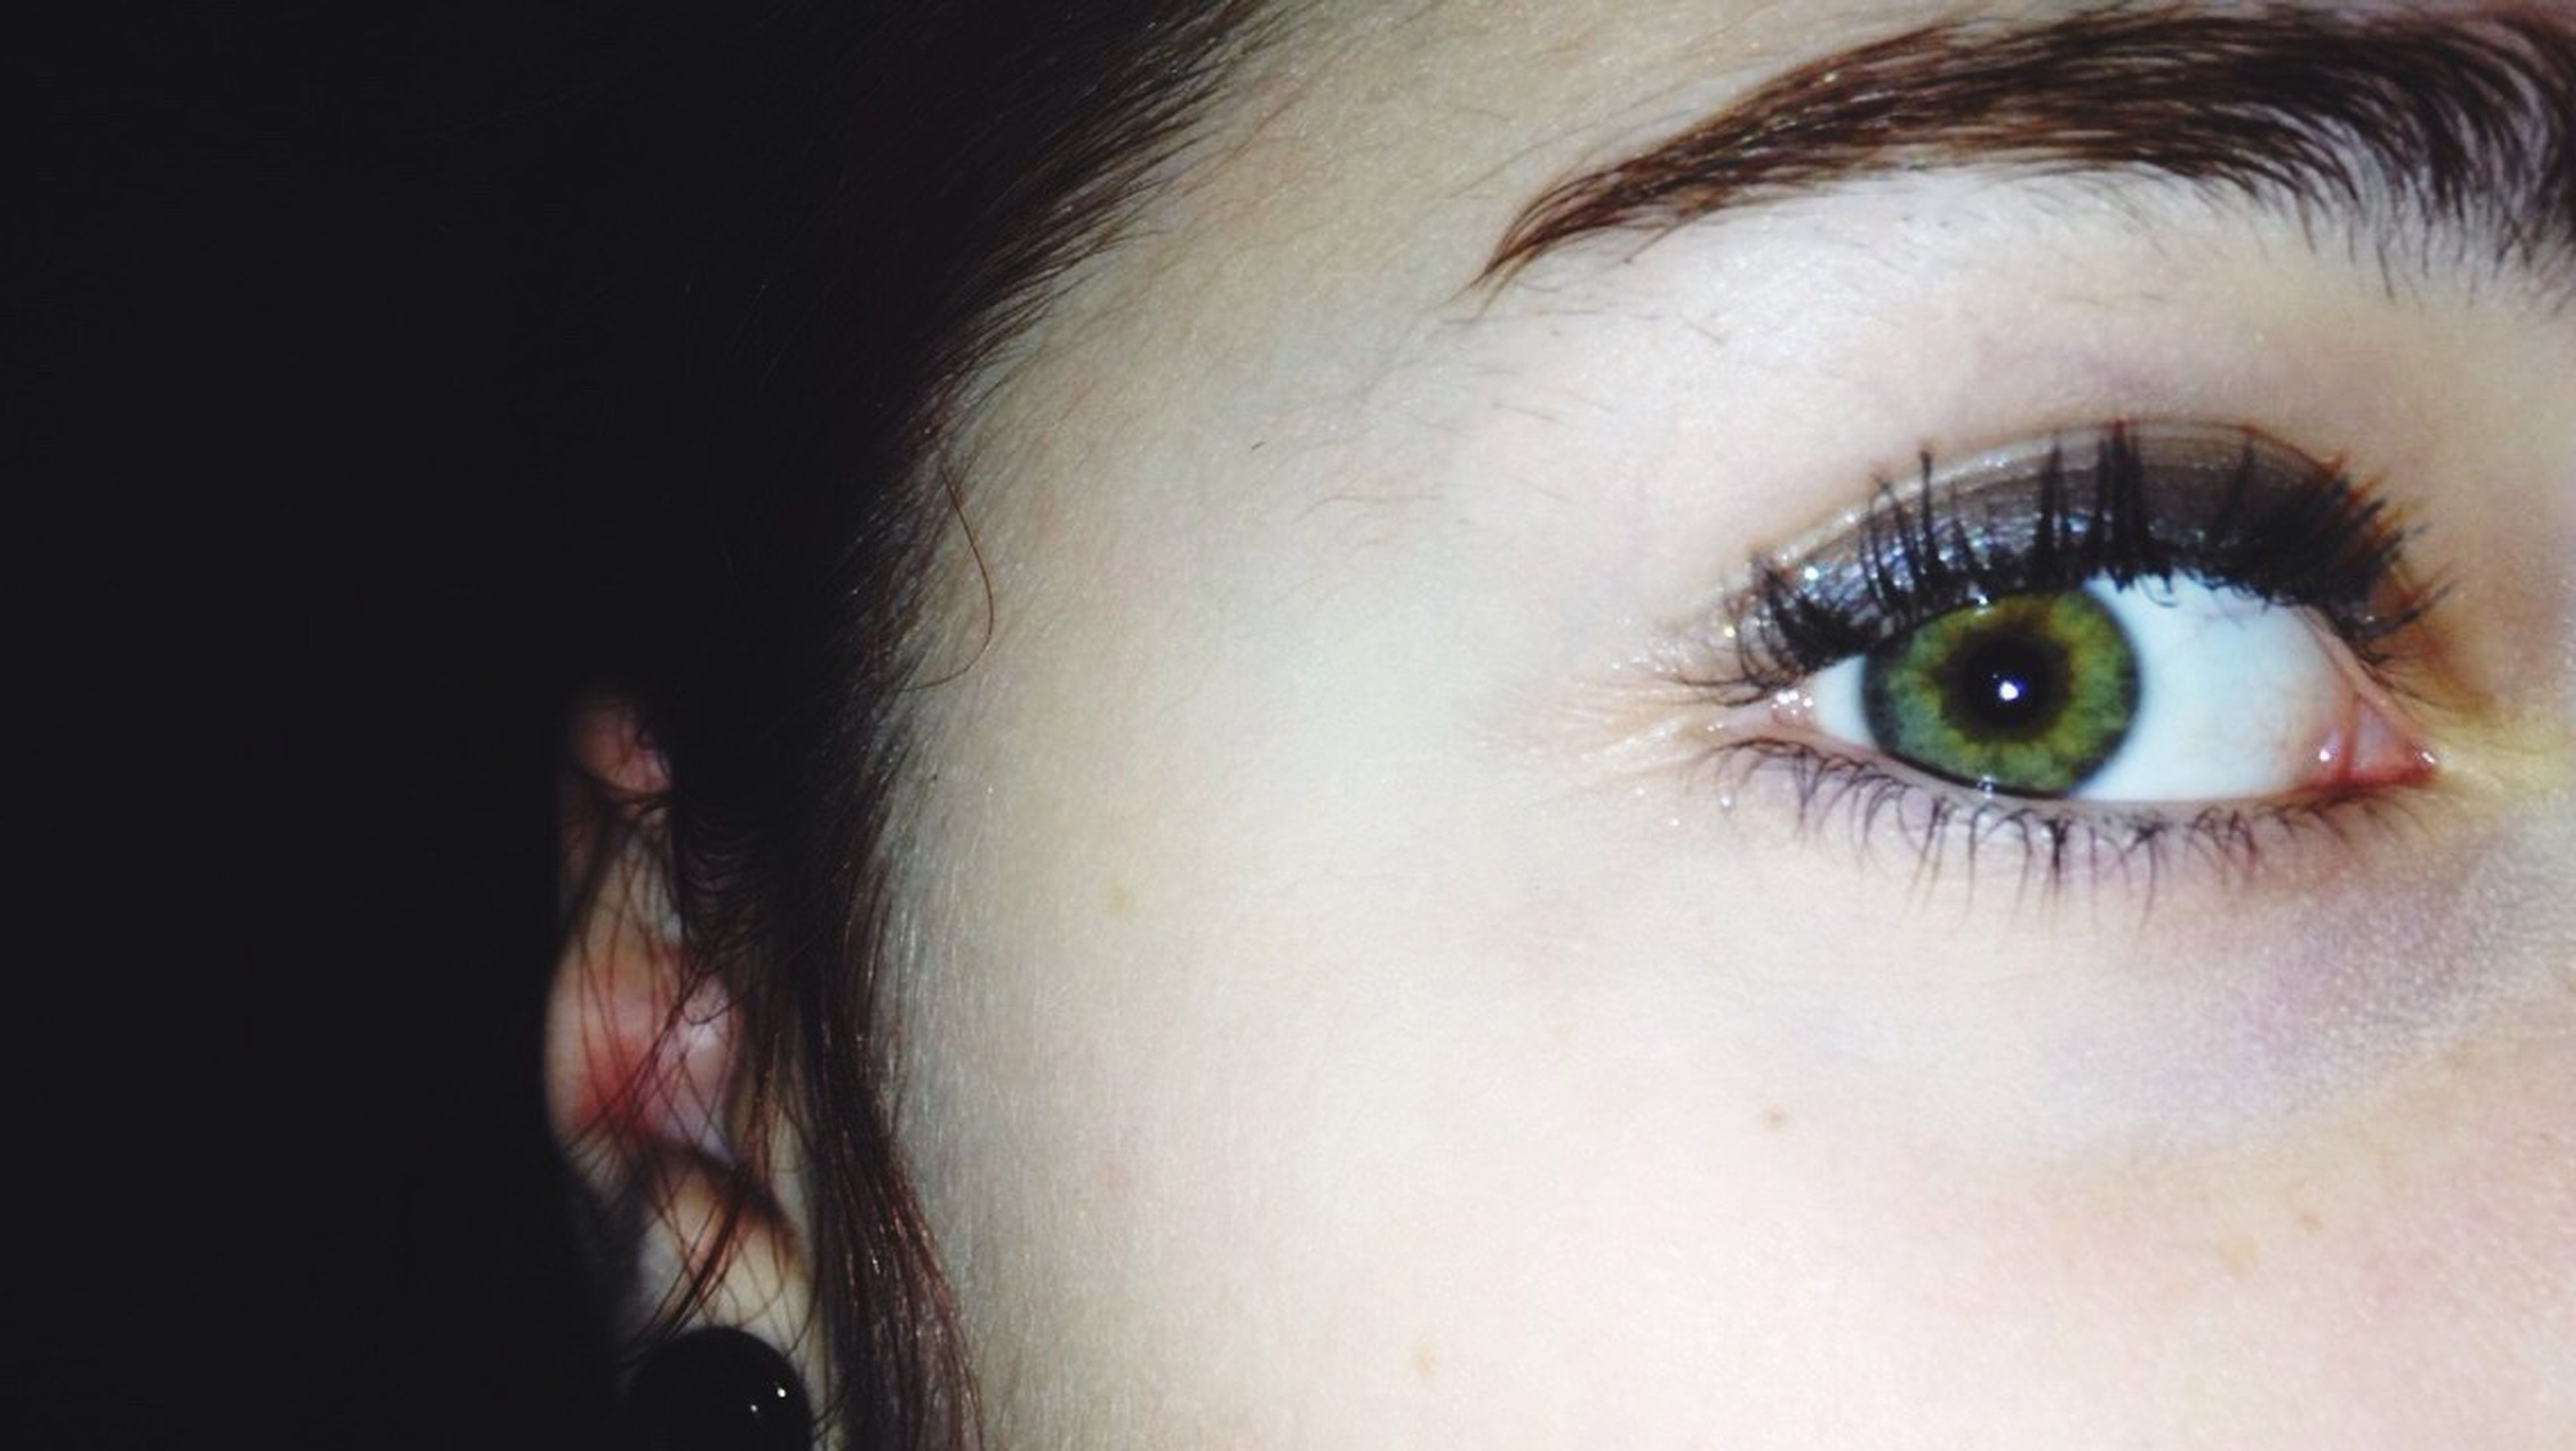 human eye, close-up, eyelash, human face, looking at camera, human skin, lifestyles, eyesight, sensory perception, portrait, part of, headshot, person, eyebrow, extreme close up, studio shot, eyeball